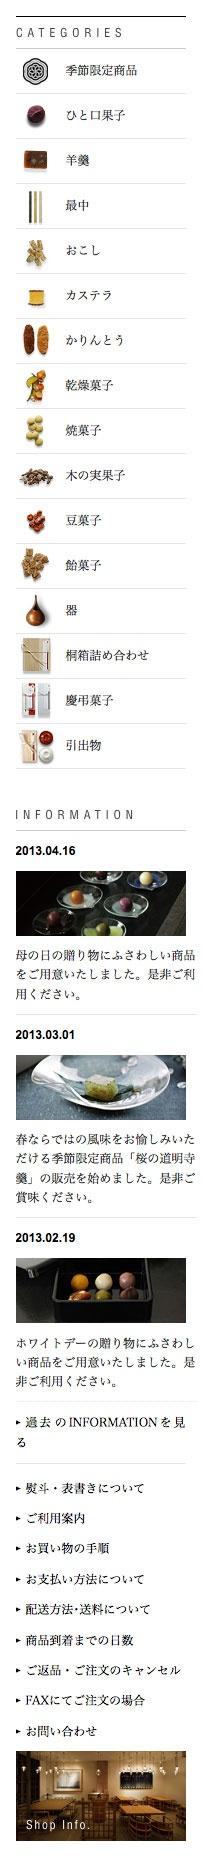 HIGASHIYA http://higashiya-shop.com